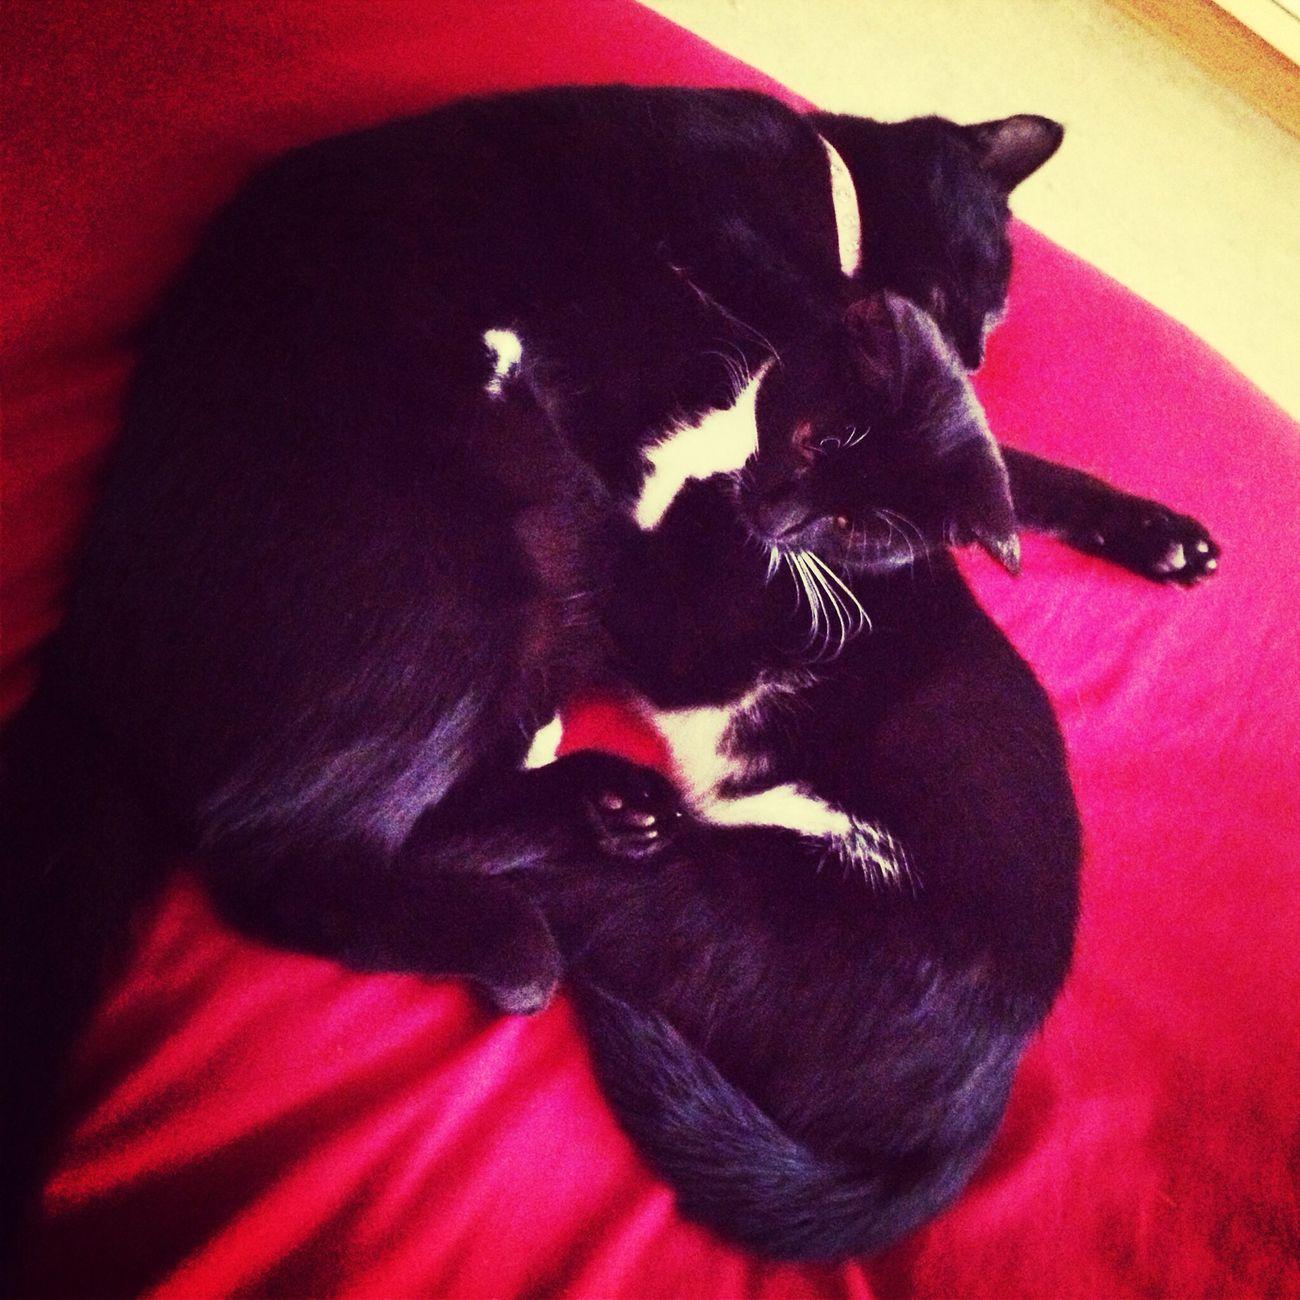 Sleeping Tired Cute Pets Beauty